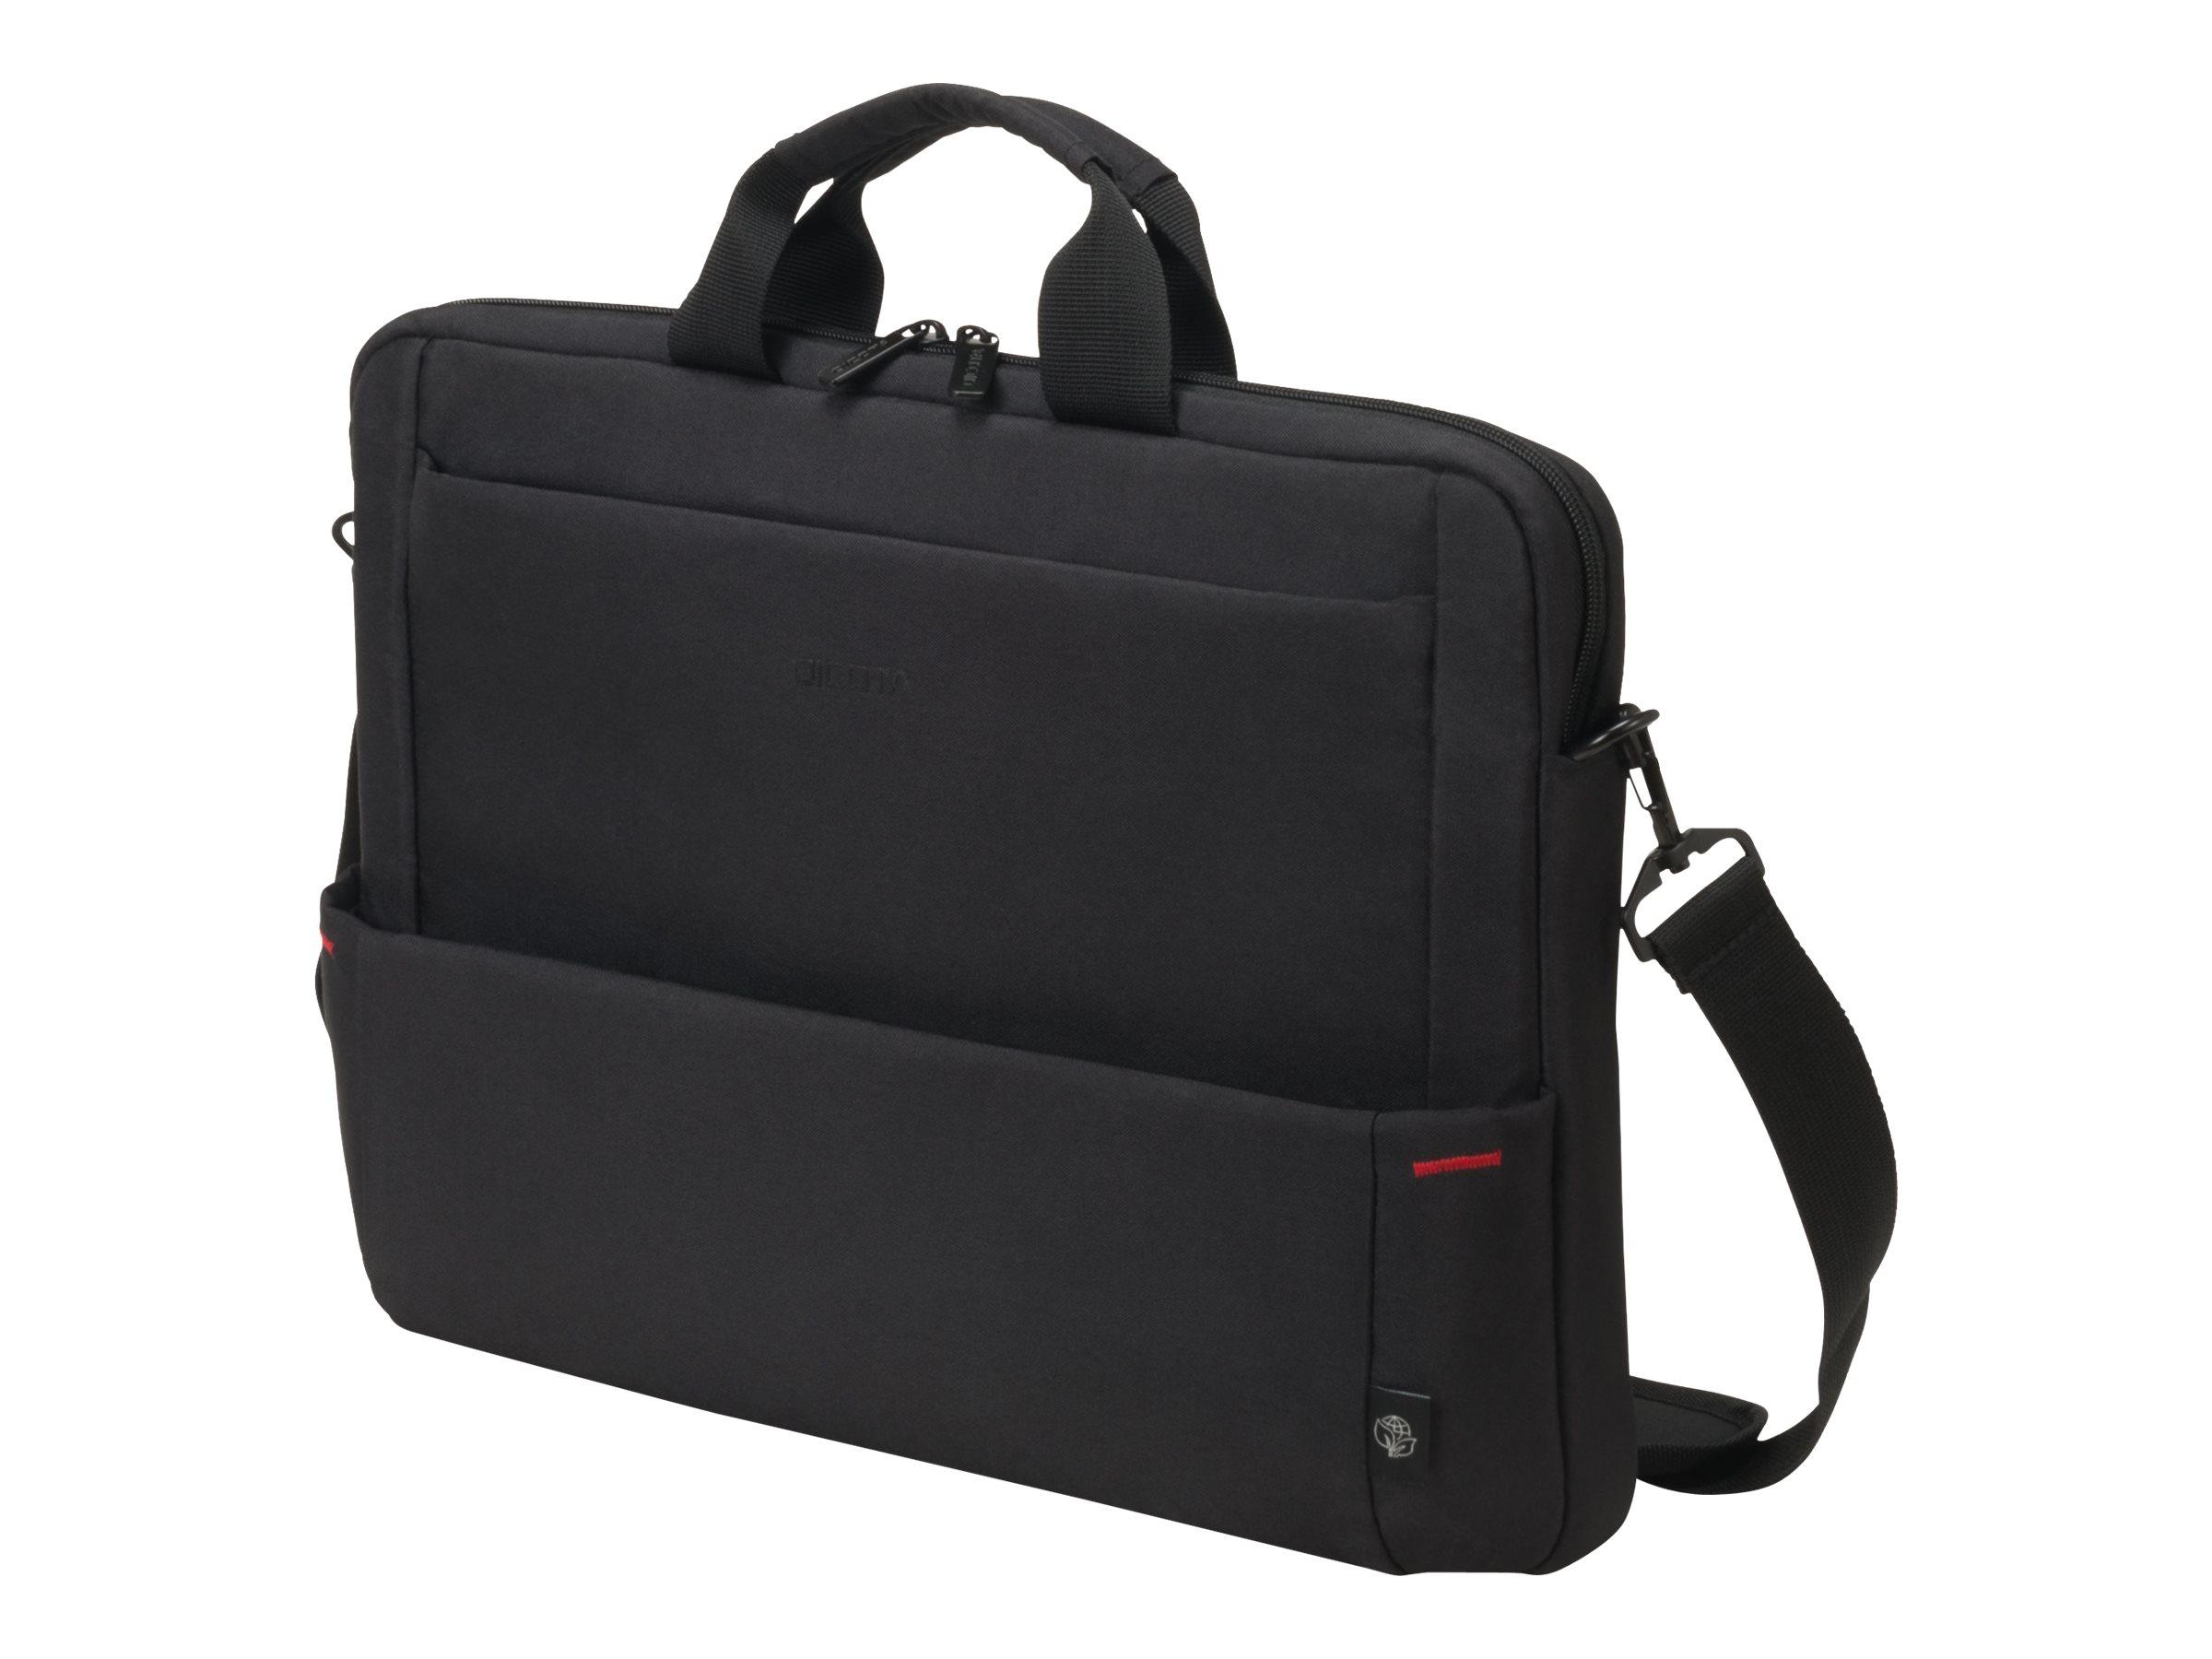 Vorschau: Dicota Eco - Notebook-Tasche - 39.6 cm - 13